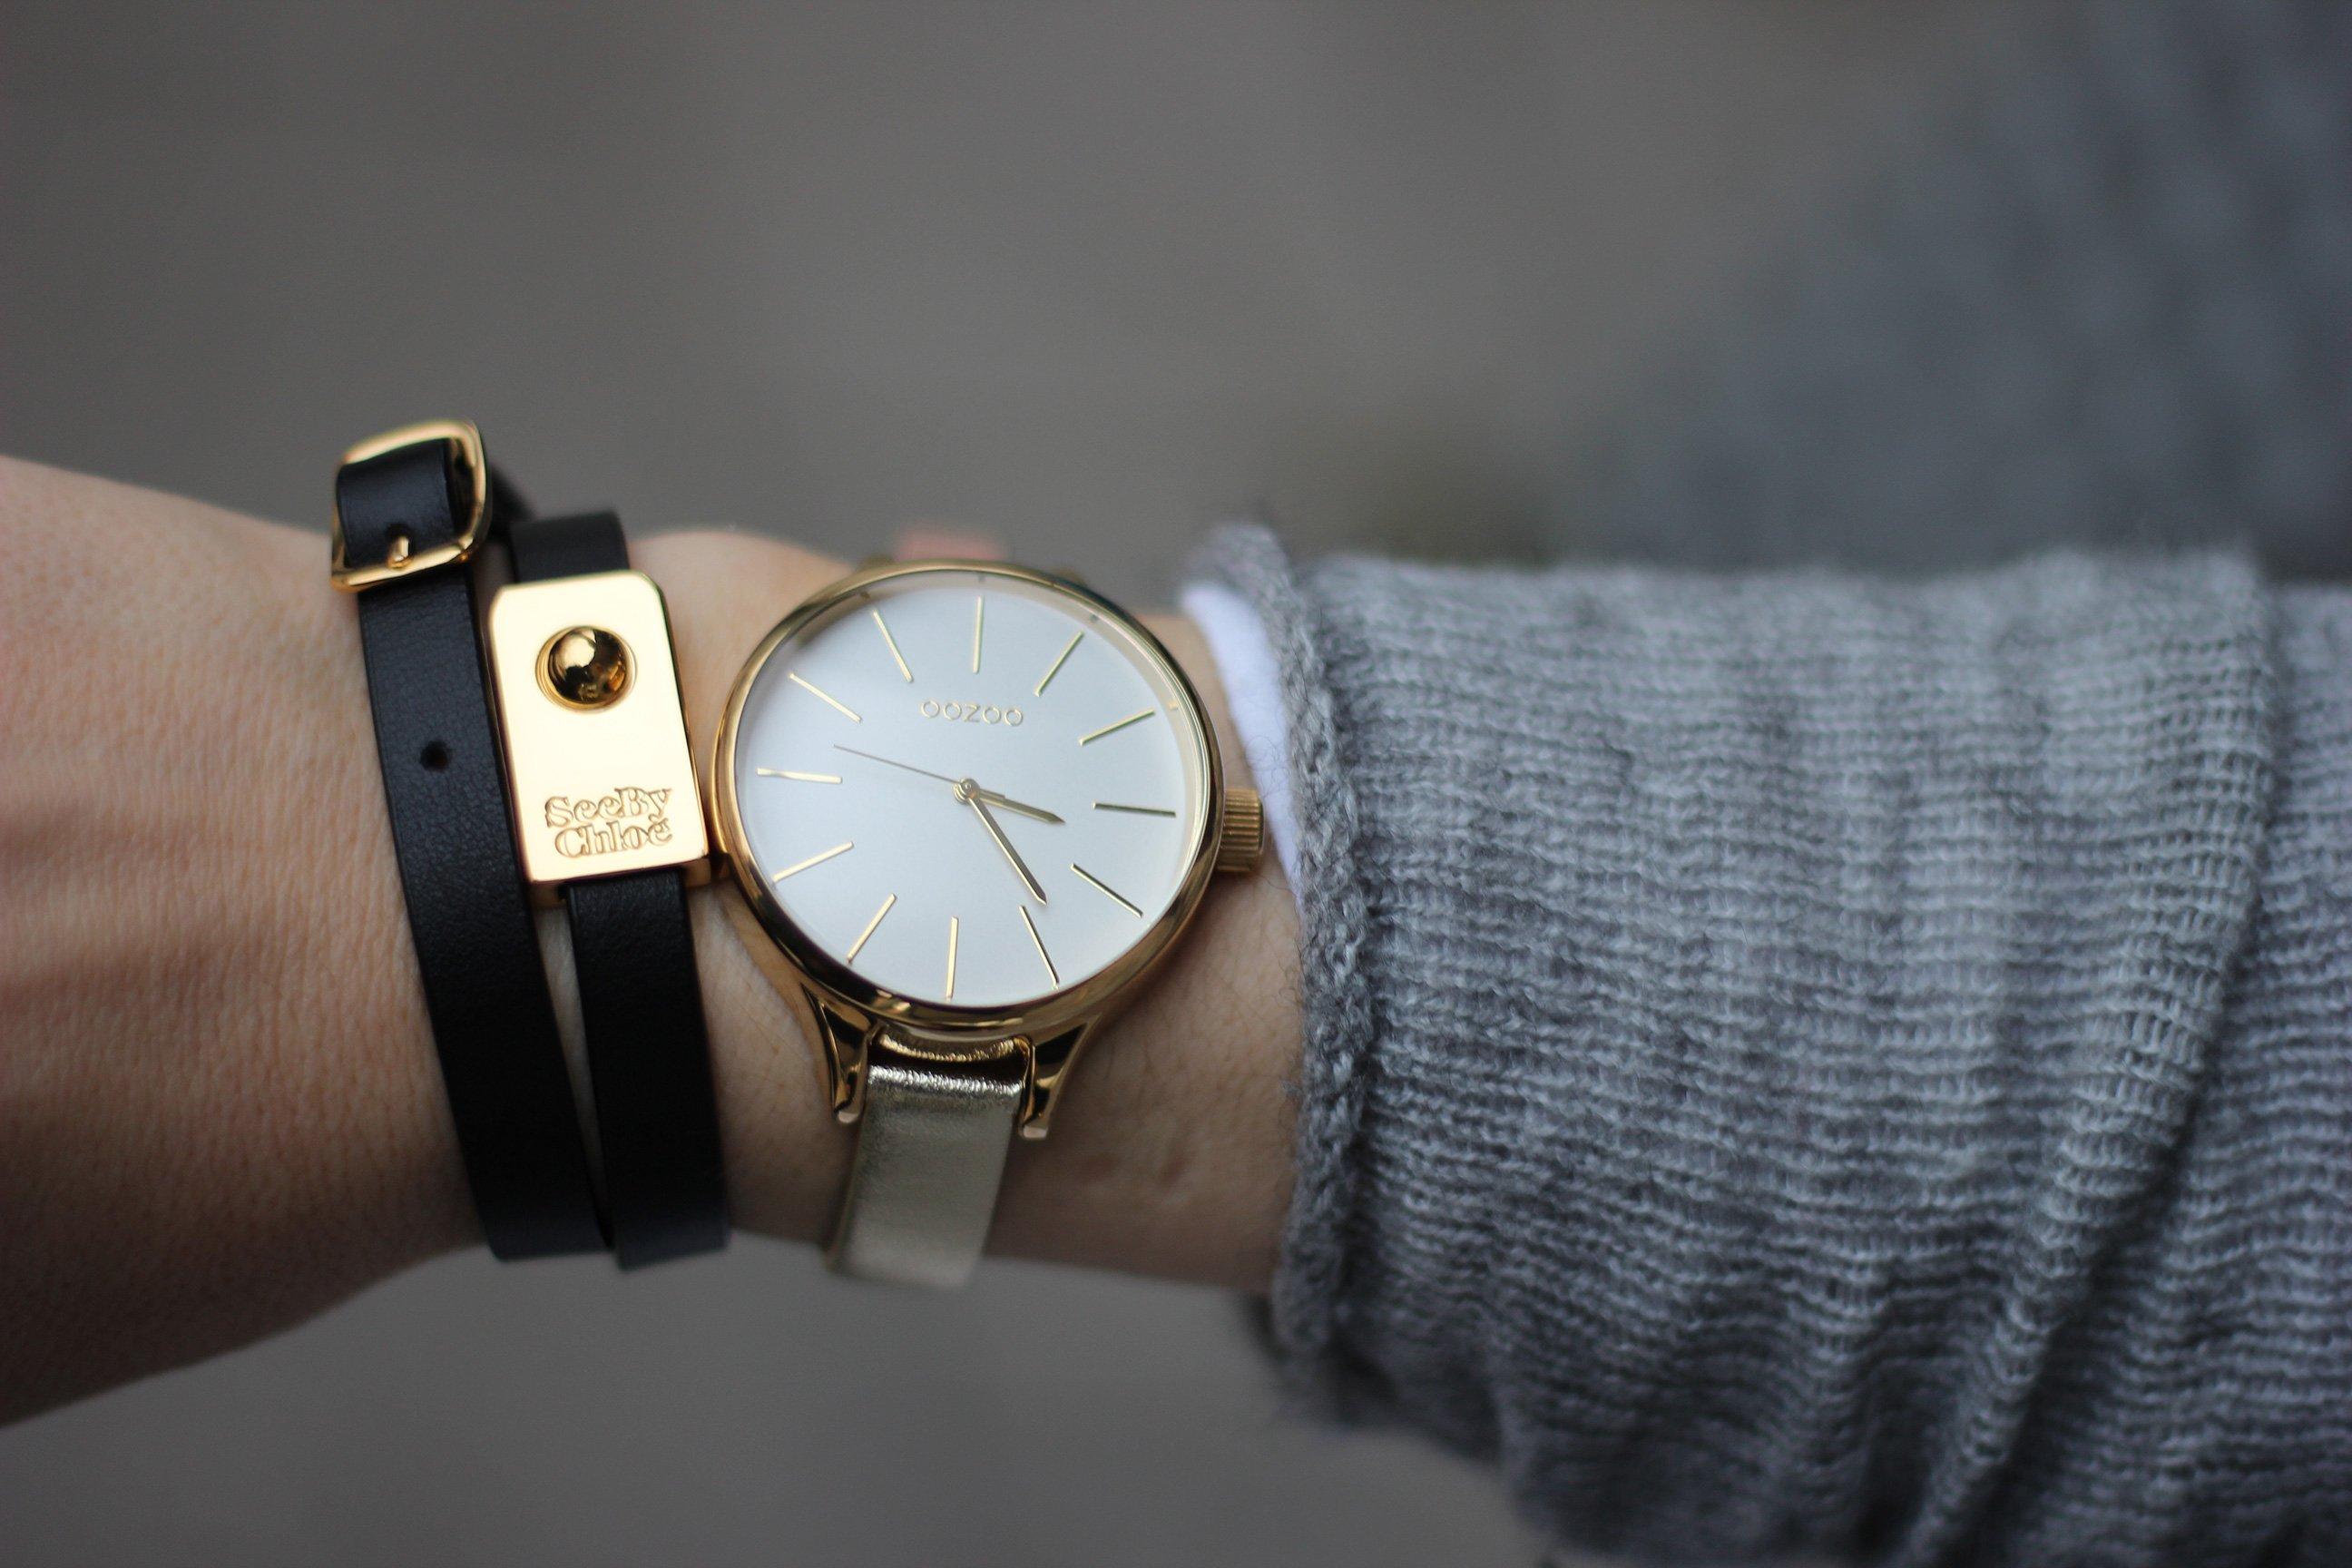 IMG_9159_Armbanduhr_new_Oozoo_watch_seebychloe_bracelet